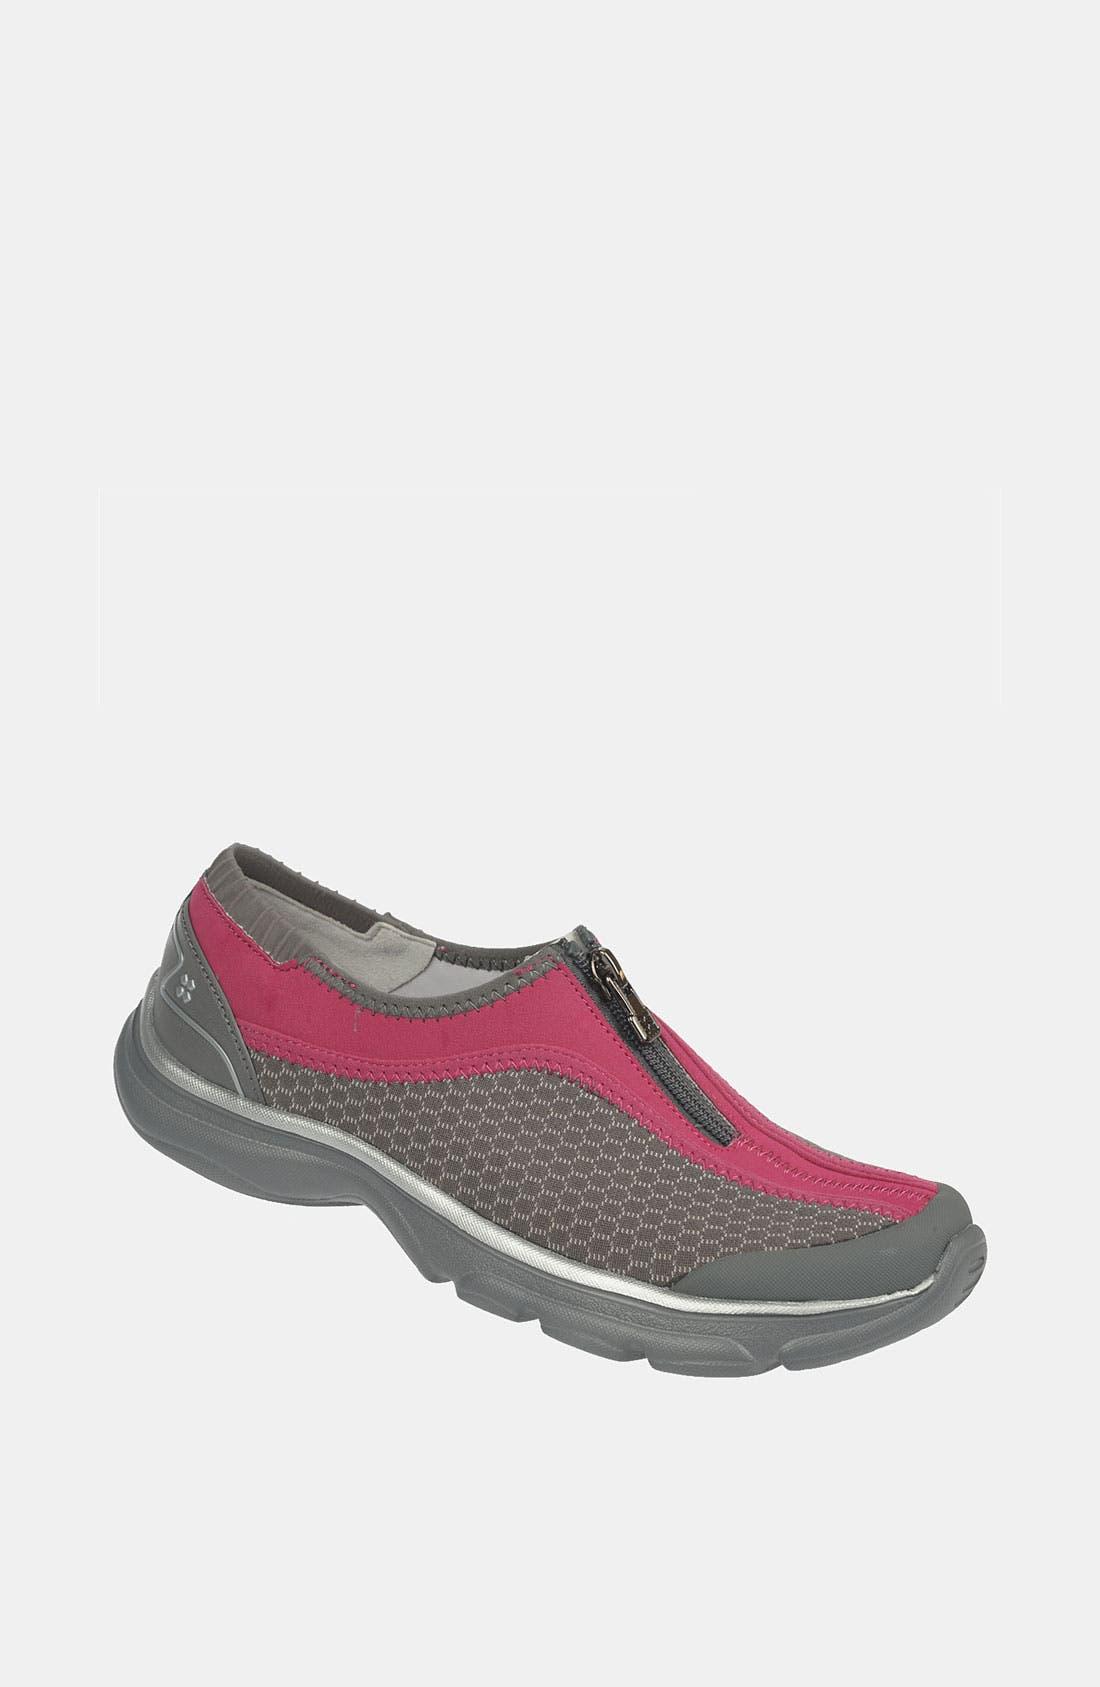 Alternate Image 1 Selected - Naturalizer 'BZees - Drive In' Walking Shoe